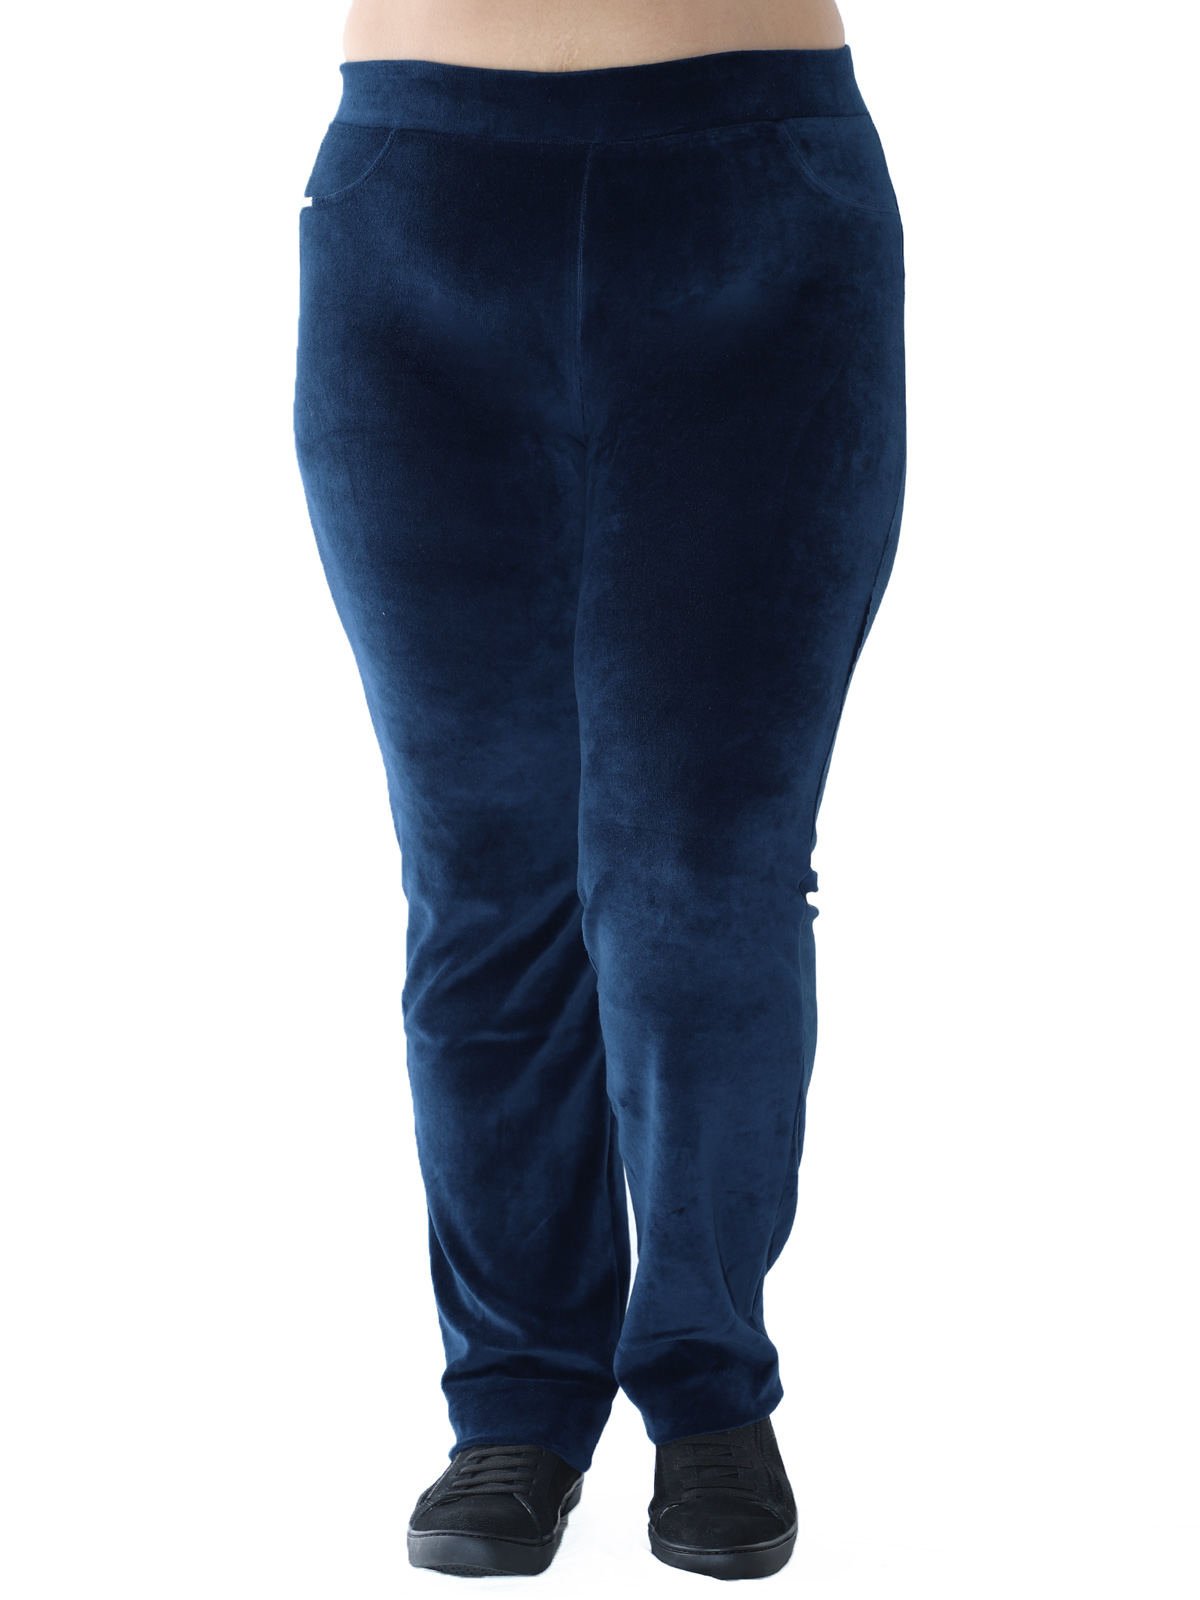 Calça Plus Size Feminina de Plush Azul Marinho